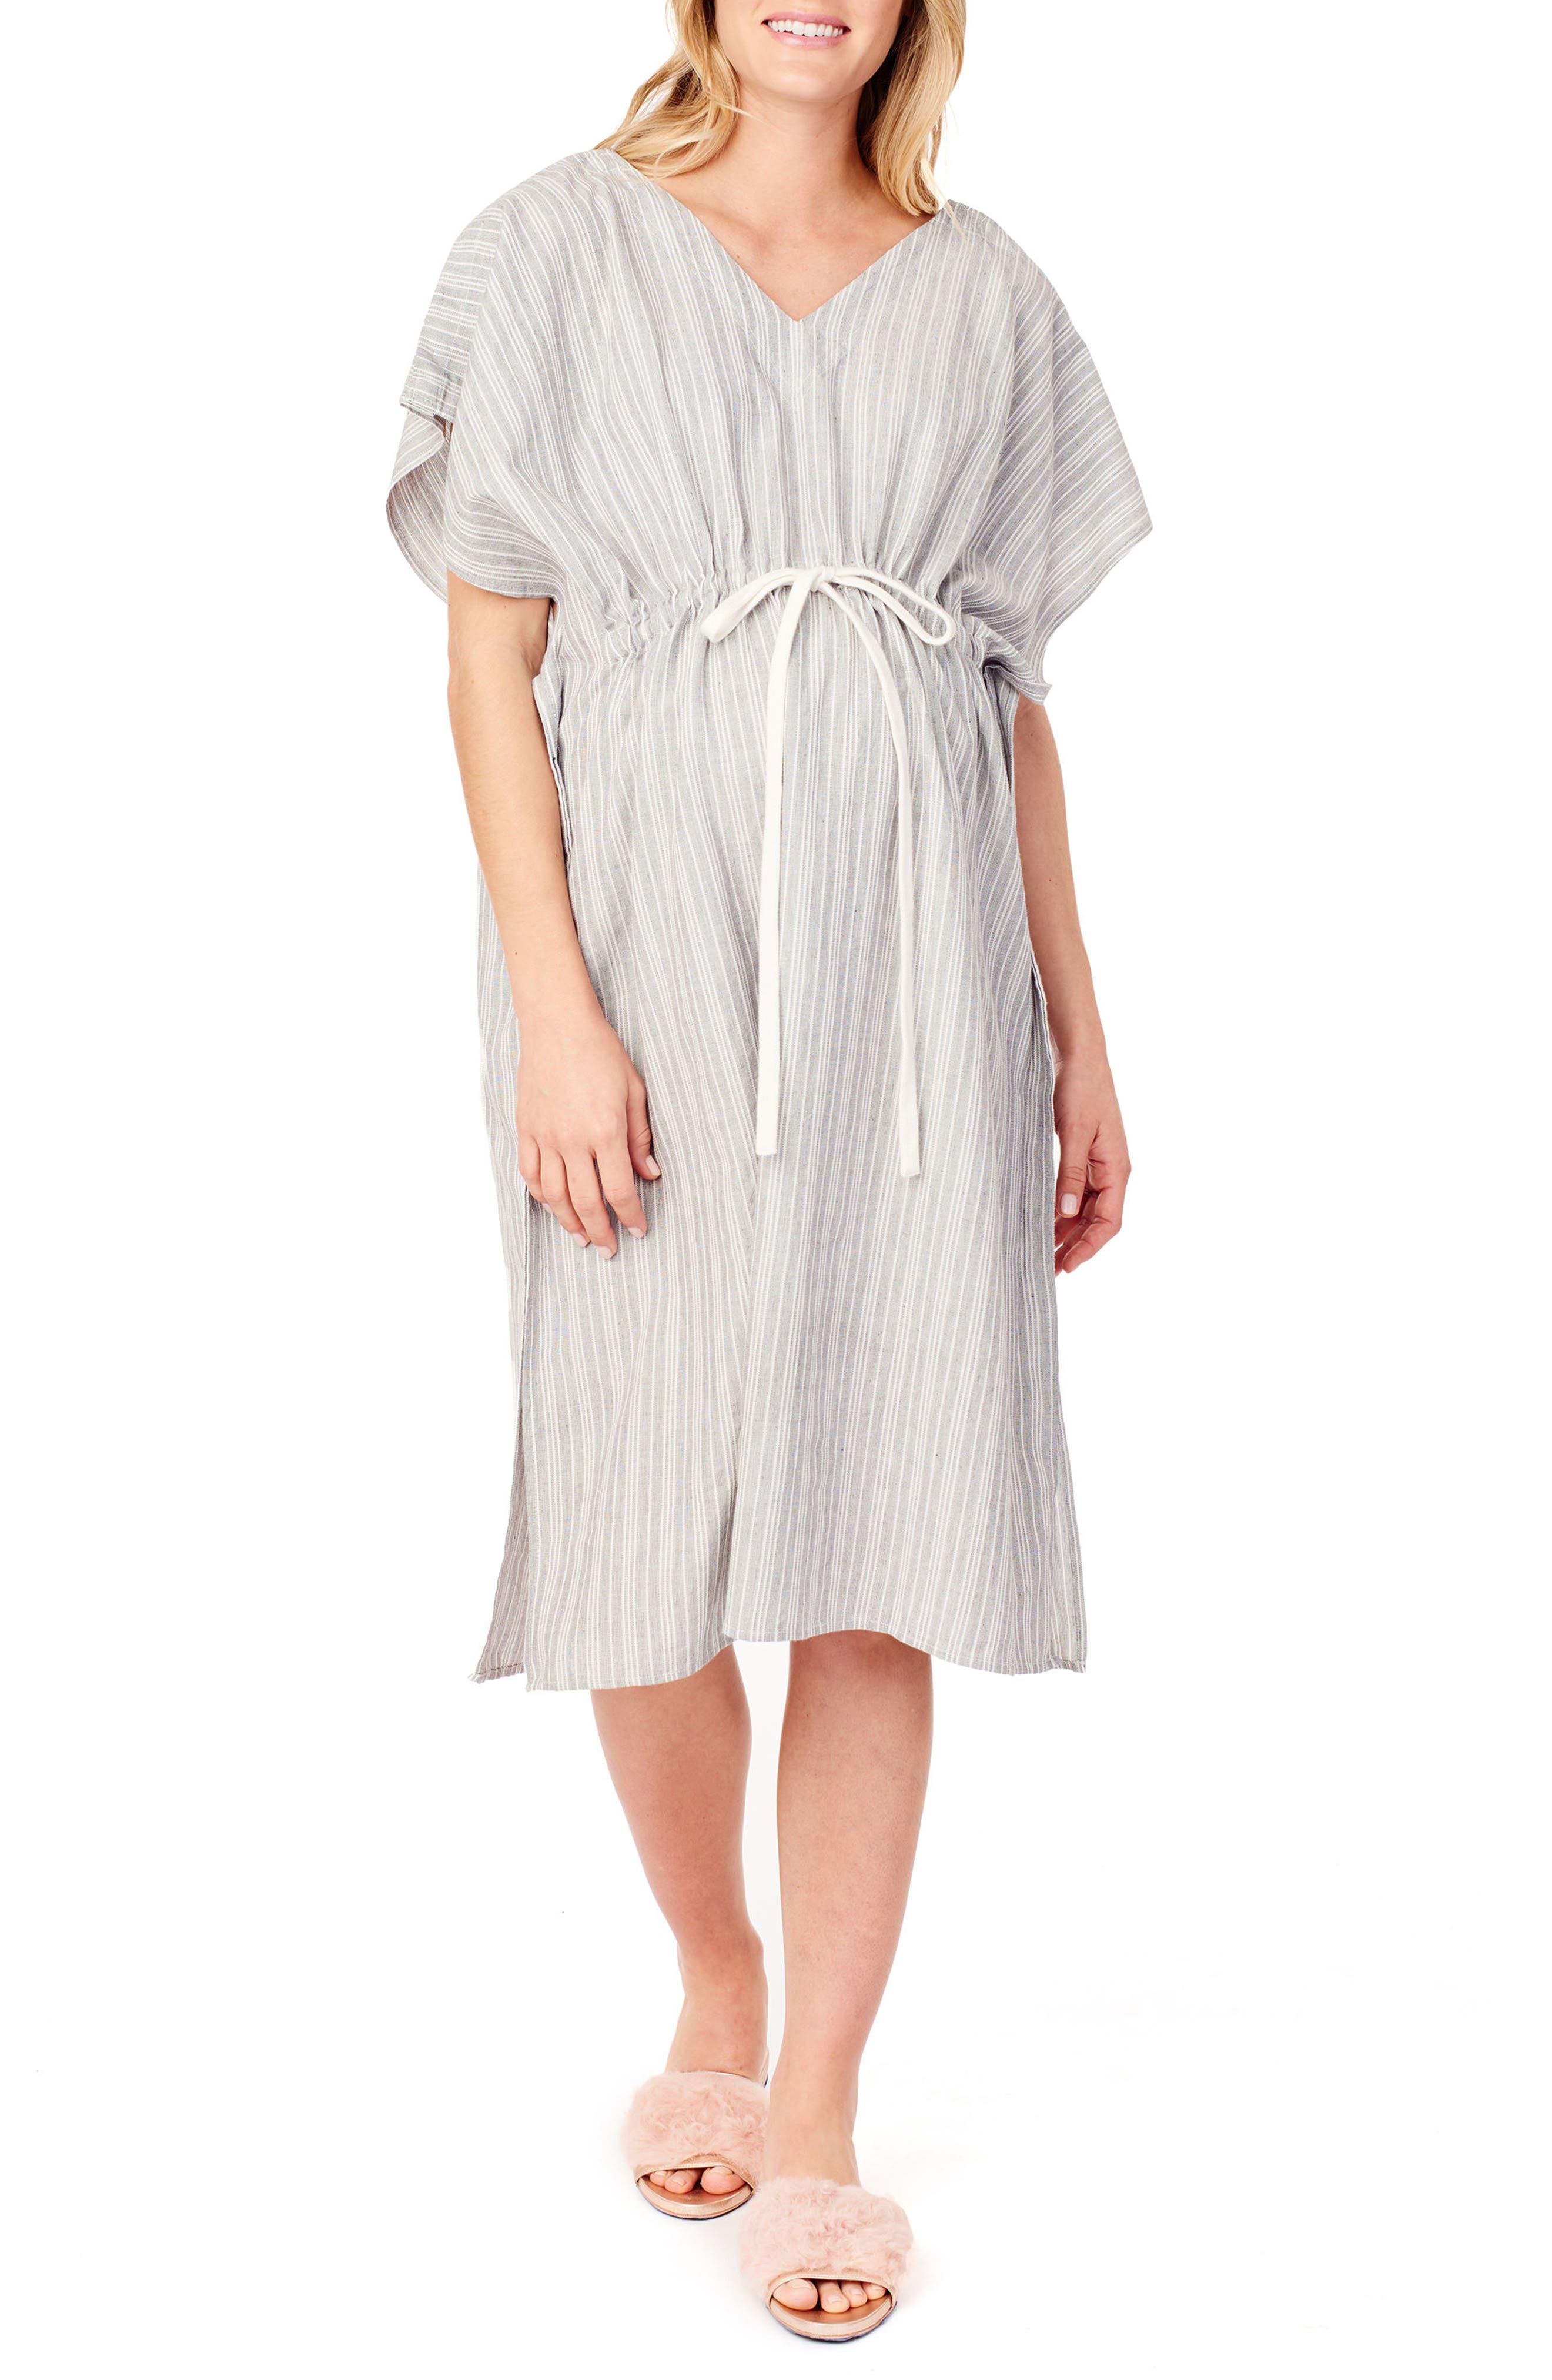 x James Fox & Co. Maternity/Nursing Hospital Gown,                         Main,                         color, BLACK/ WHITE DOBBY STRIPE